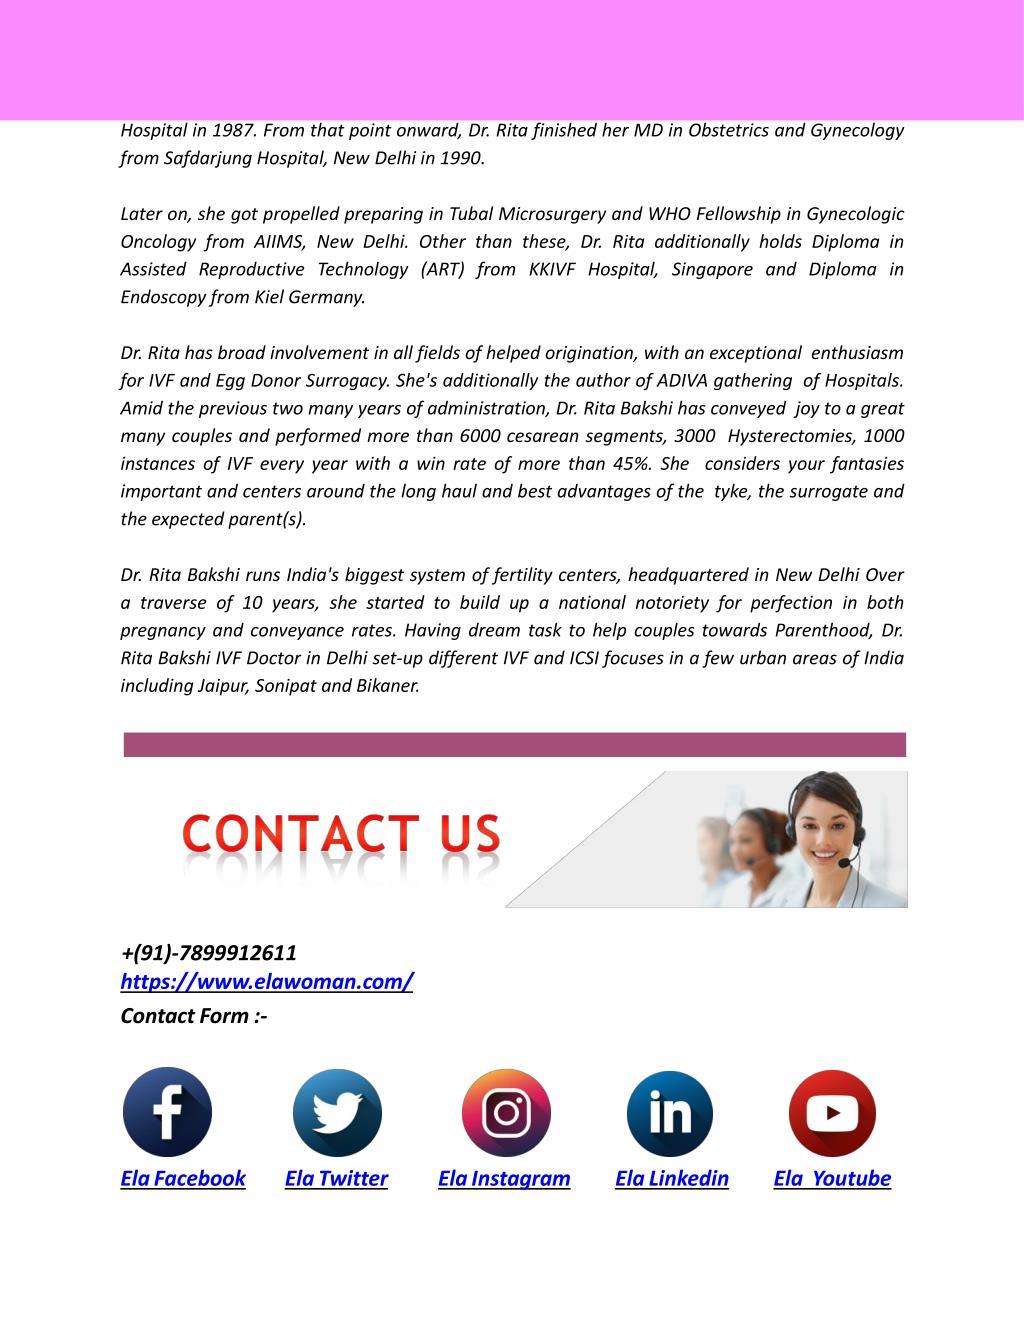 PPT - Top IVF Doctors in Delhi Ncr   Dr  Rita Bakshi   ElaWoman